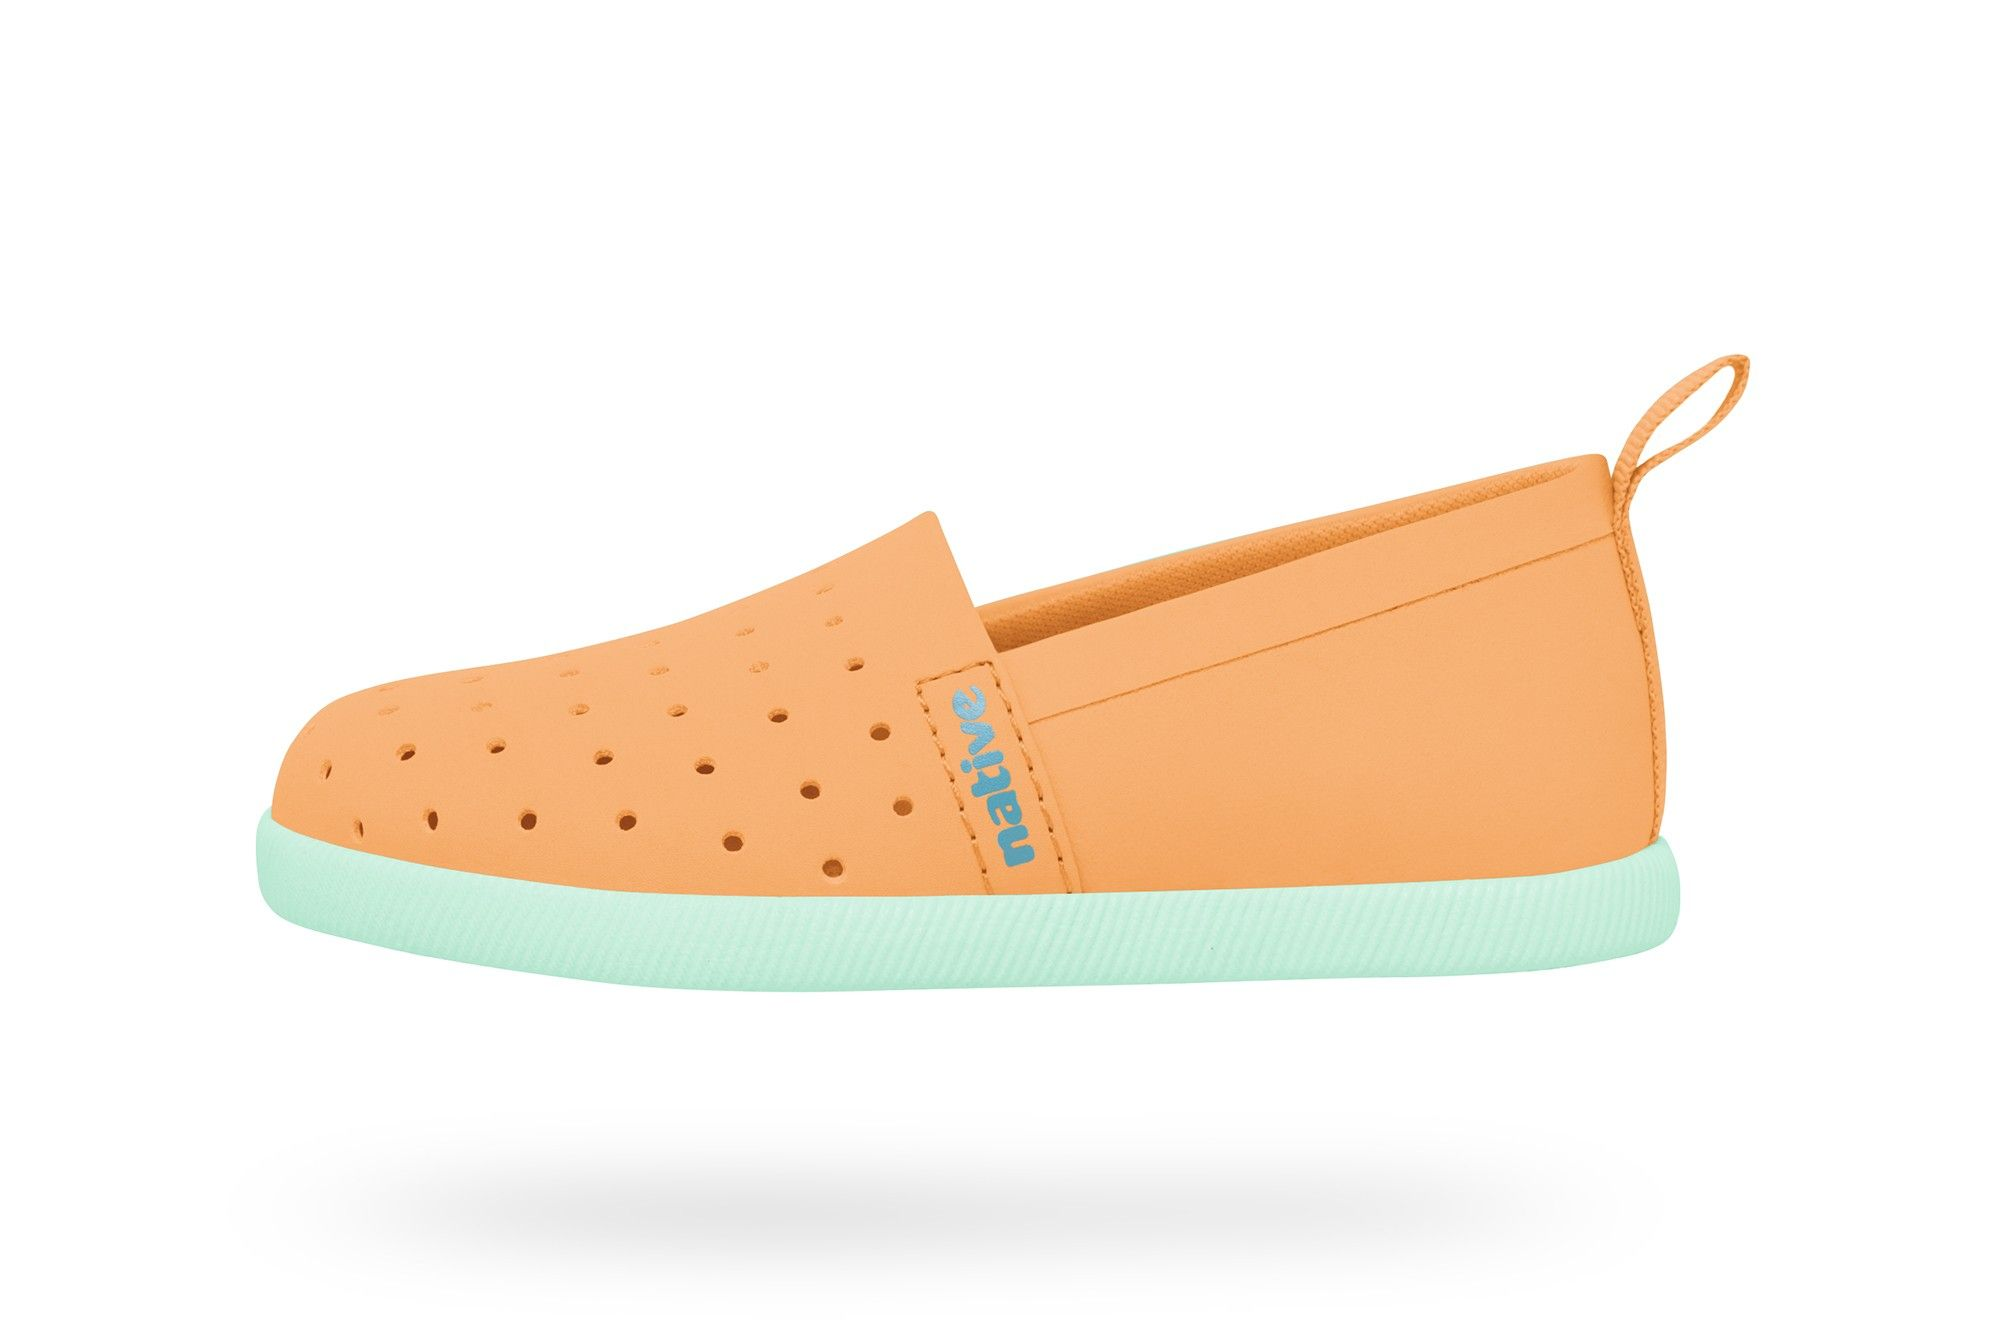 Venice Kds -e by Native Shoes #footwear #unisex #kids #lightweight #summershoes